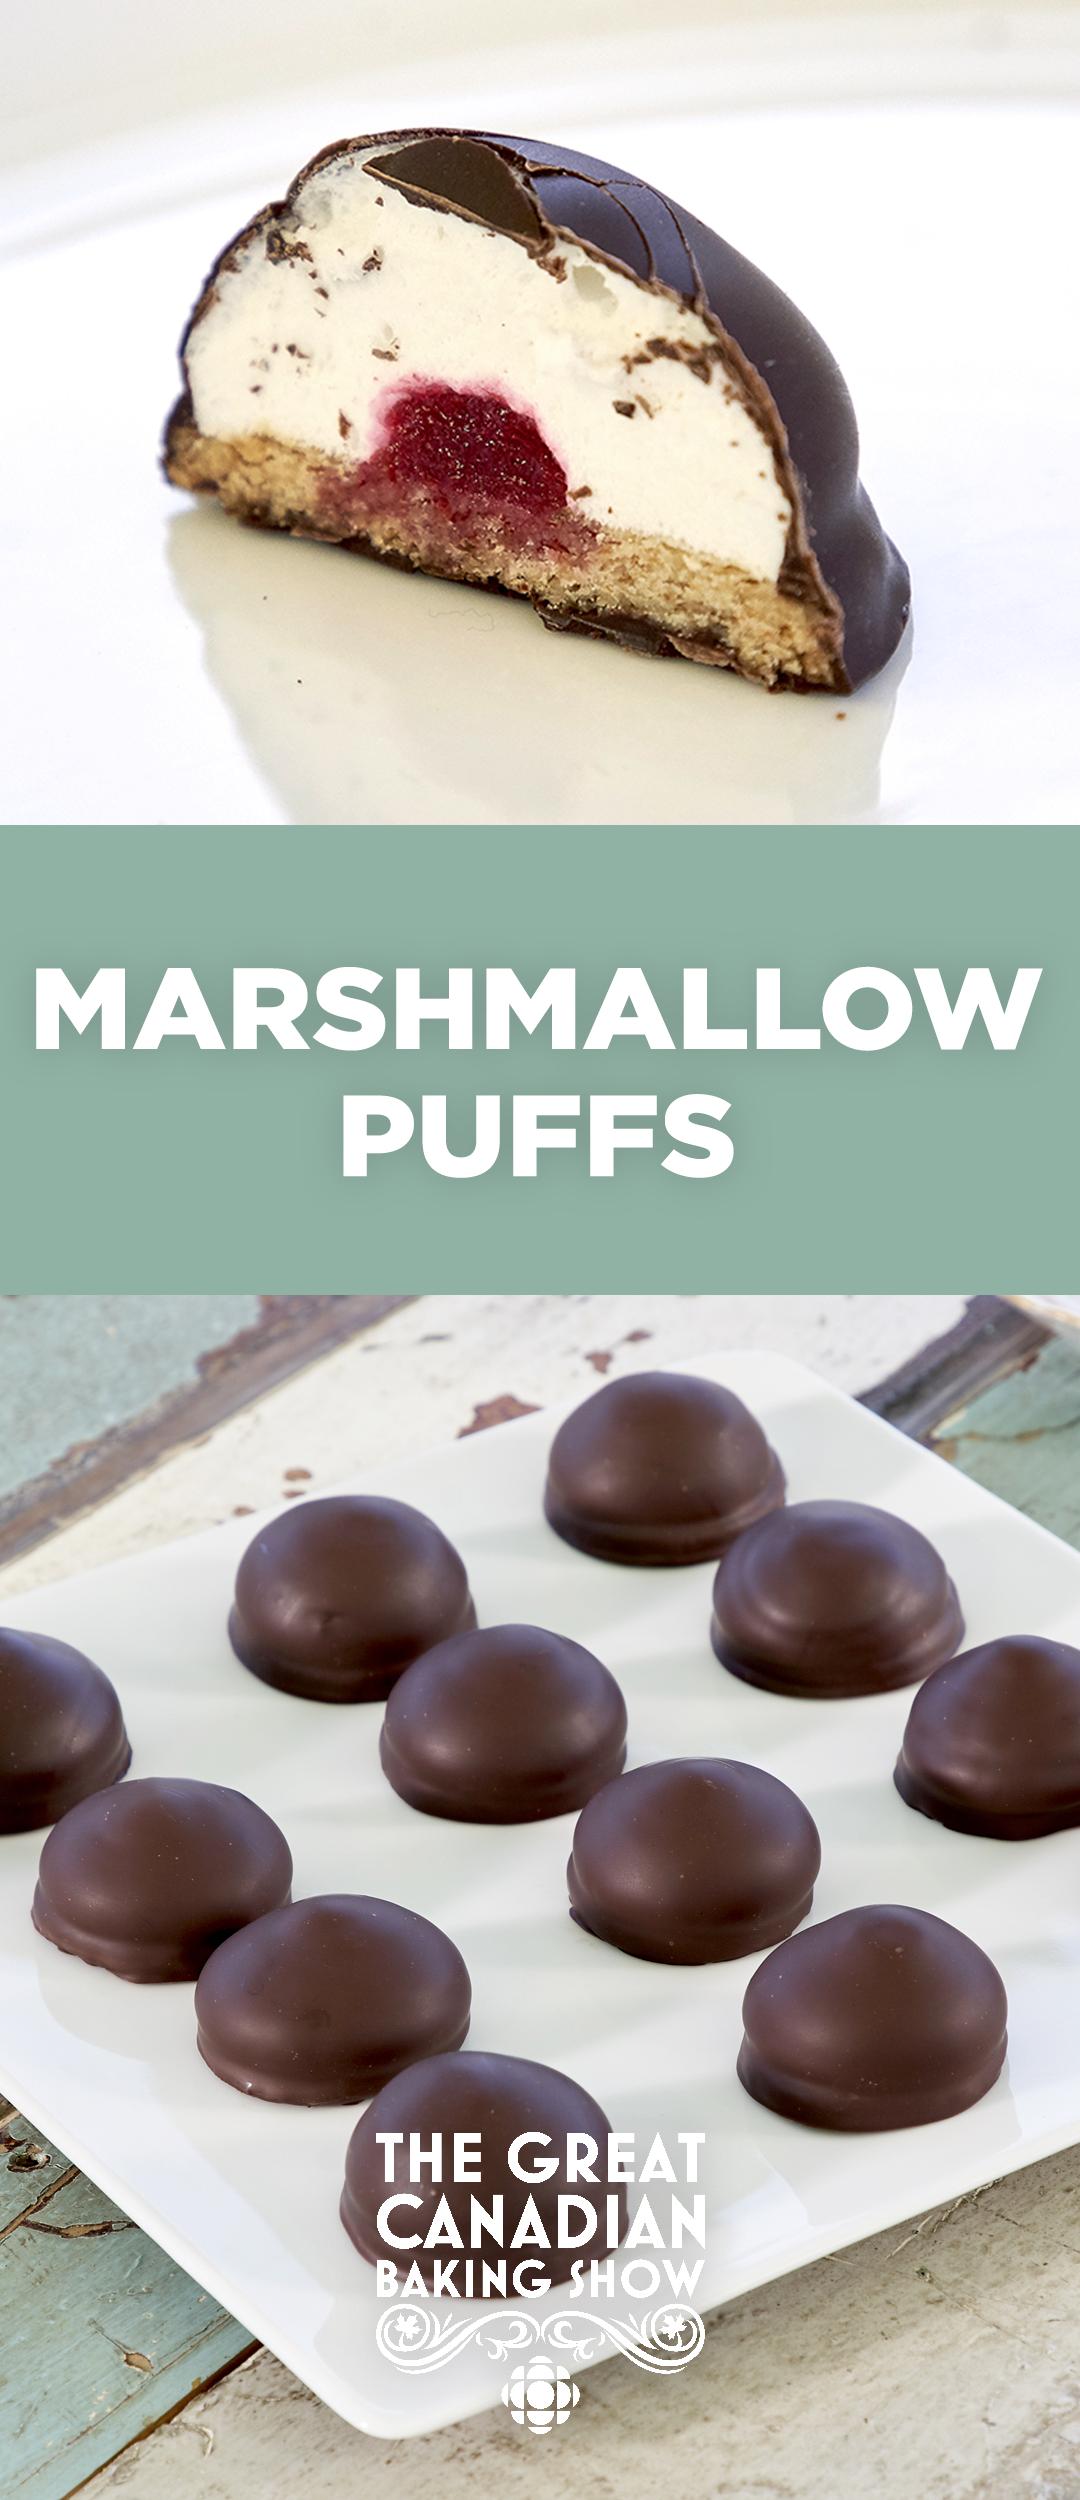 Marshmallow Puffs